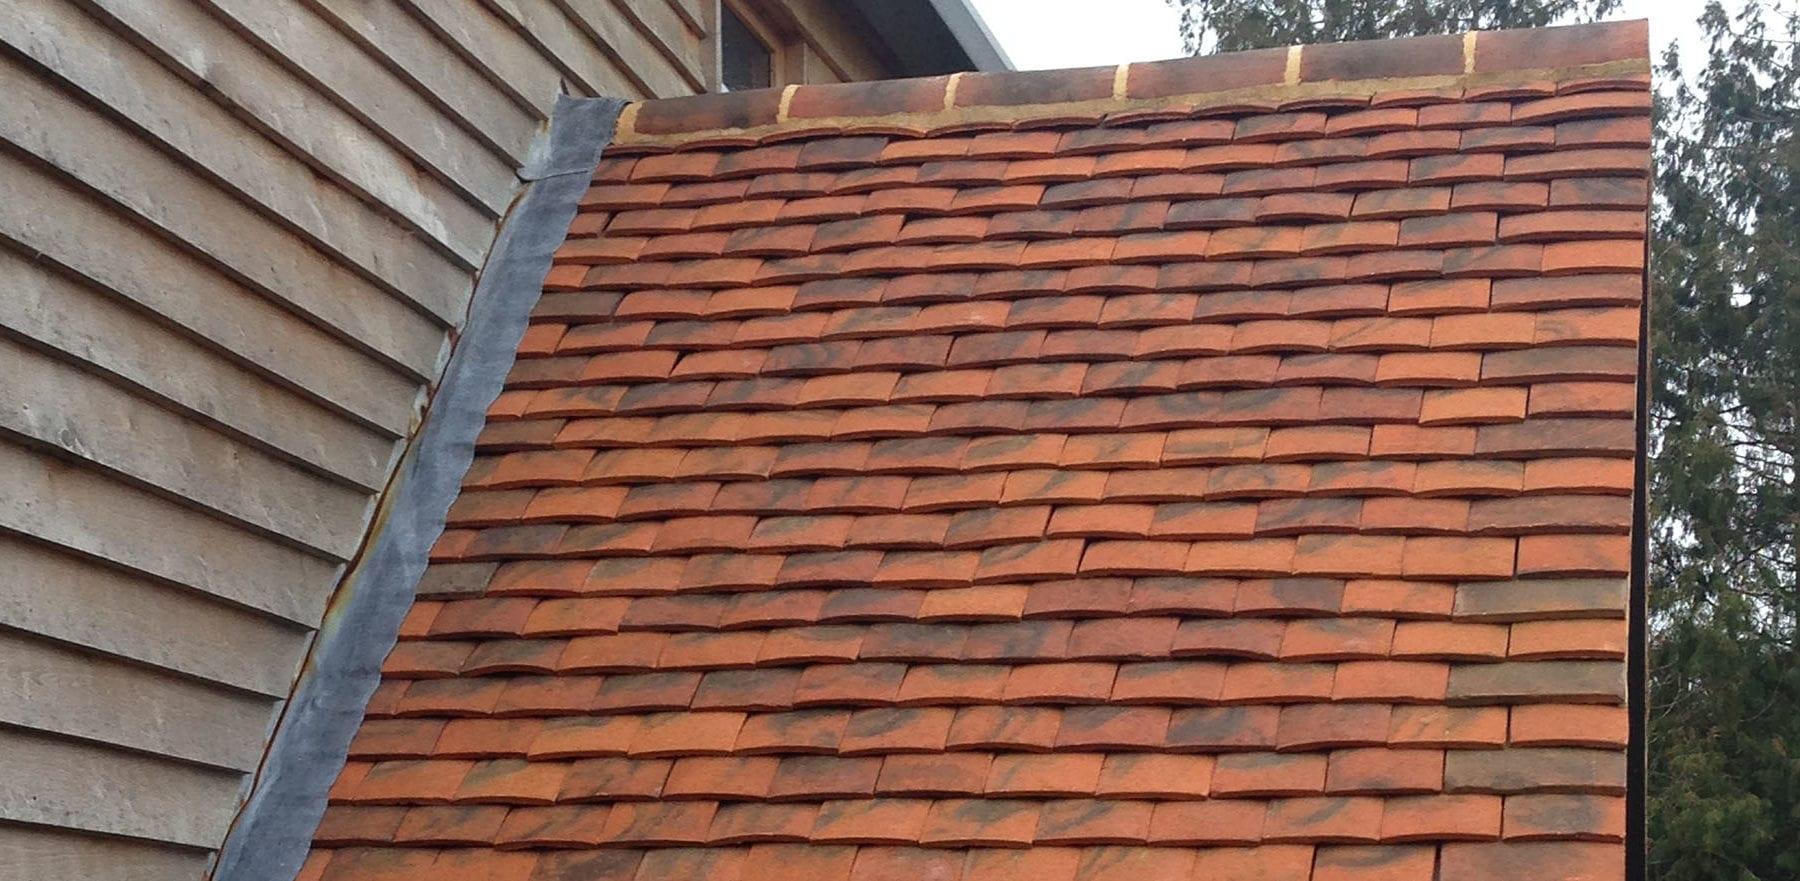 Lifestiles - Handmade Berkshire Clay Roof Tiles - Hartwood Oak, England 3